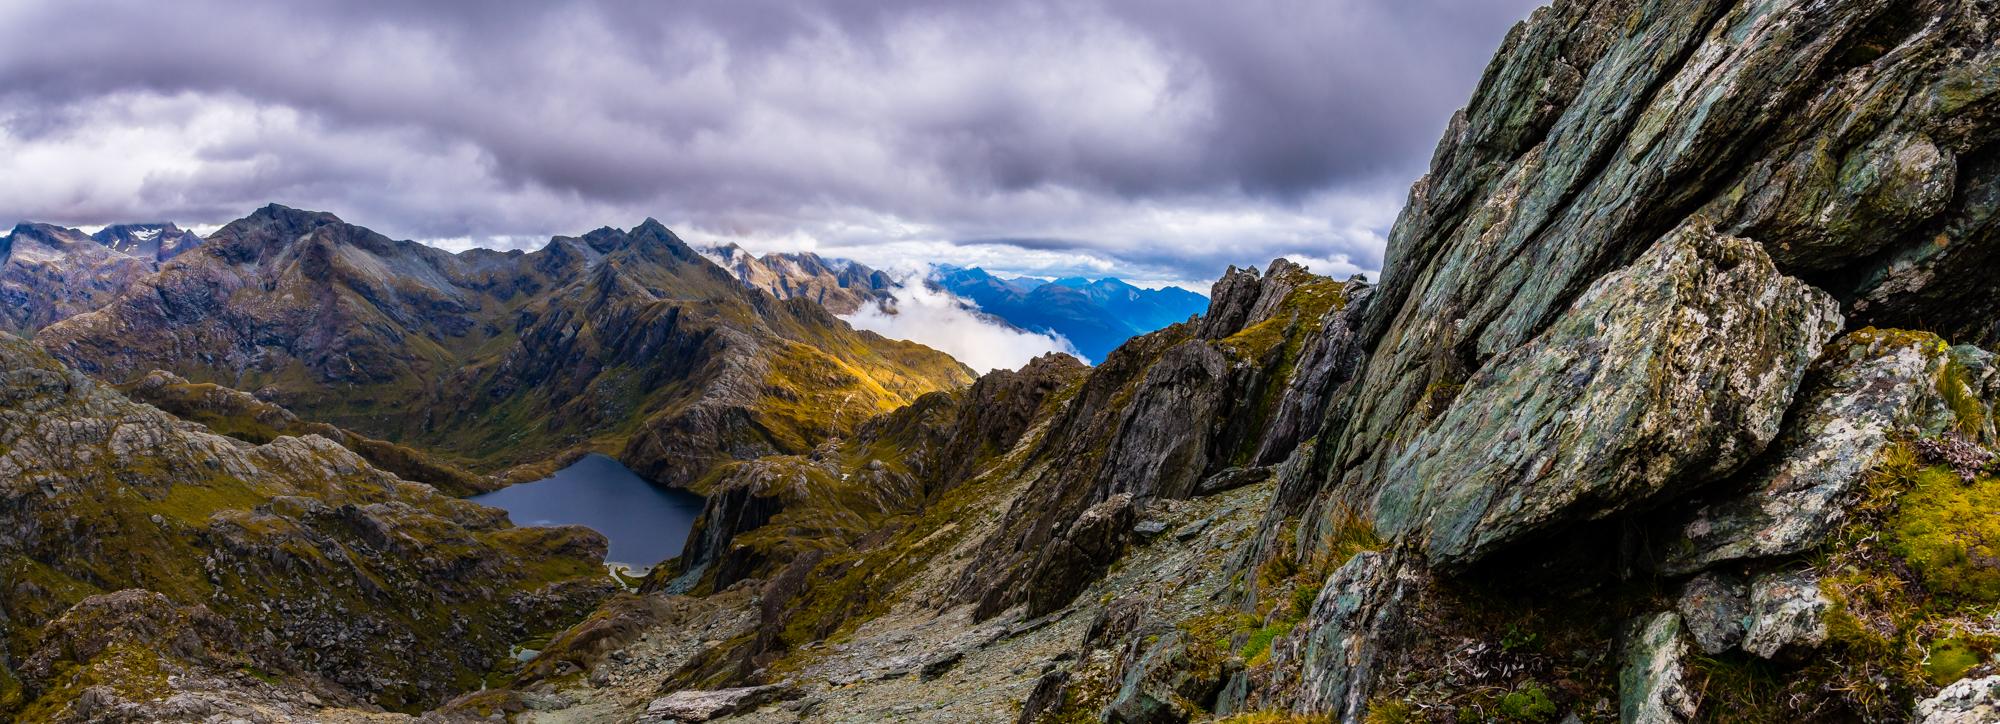 Serpentine Range,New Zealand, New Zealand